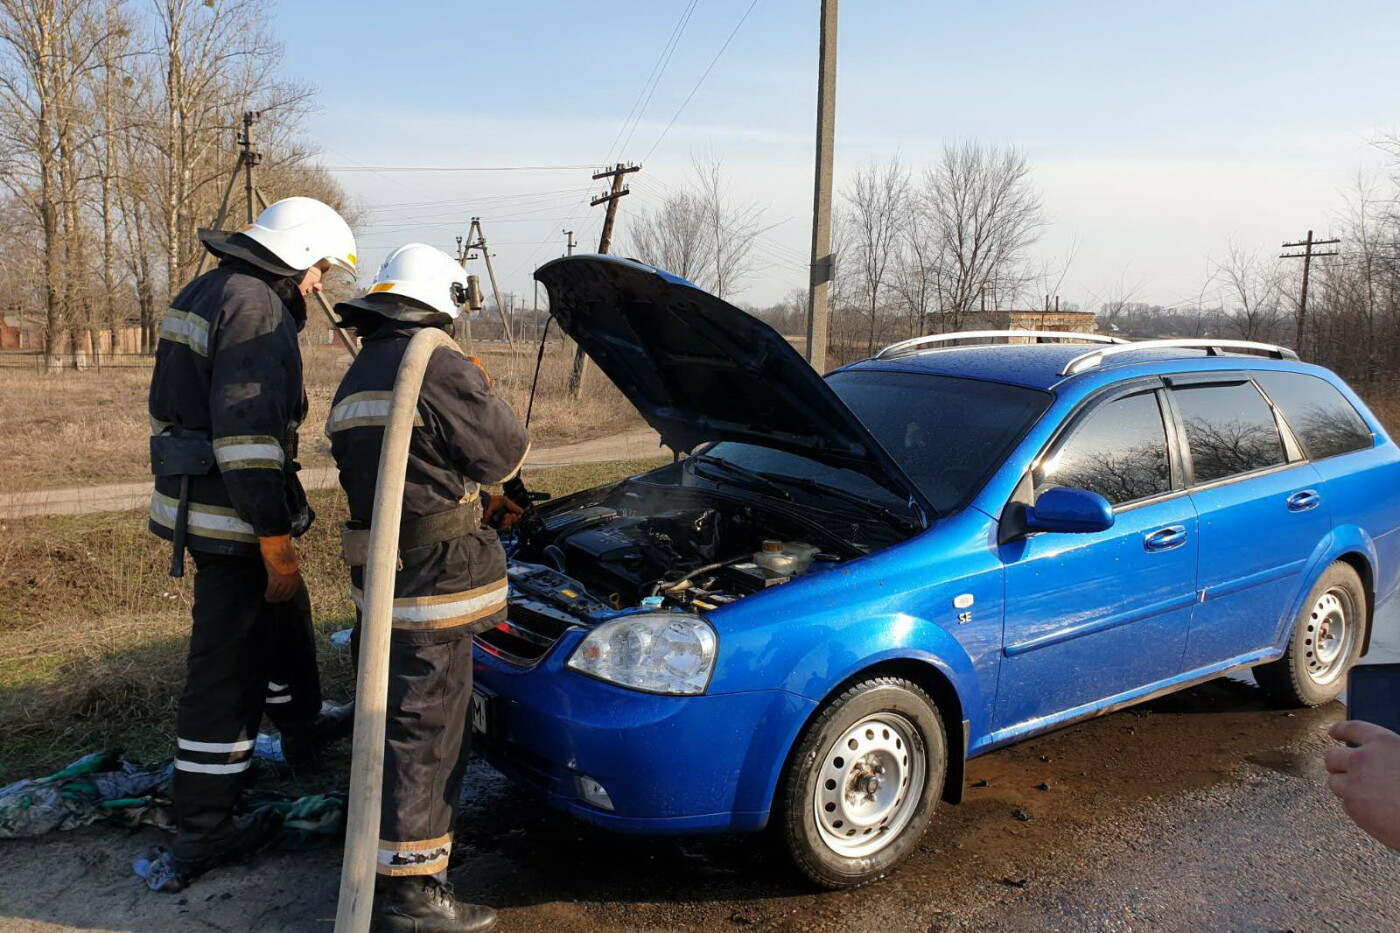 Под Харьковом во время движения загорелся «Chevrolet Lacetti», - ФОТО, фото-1